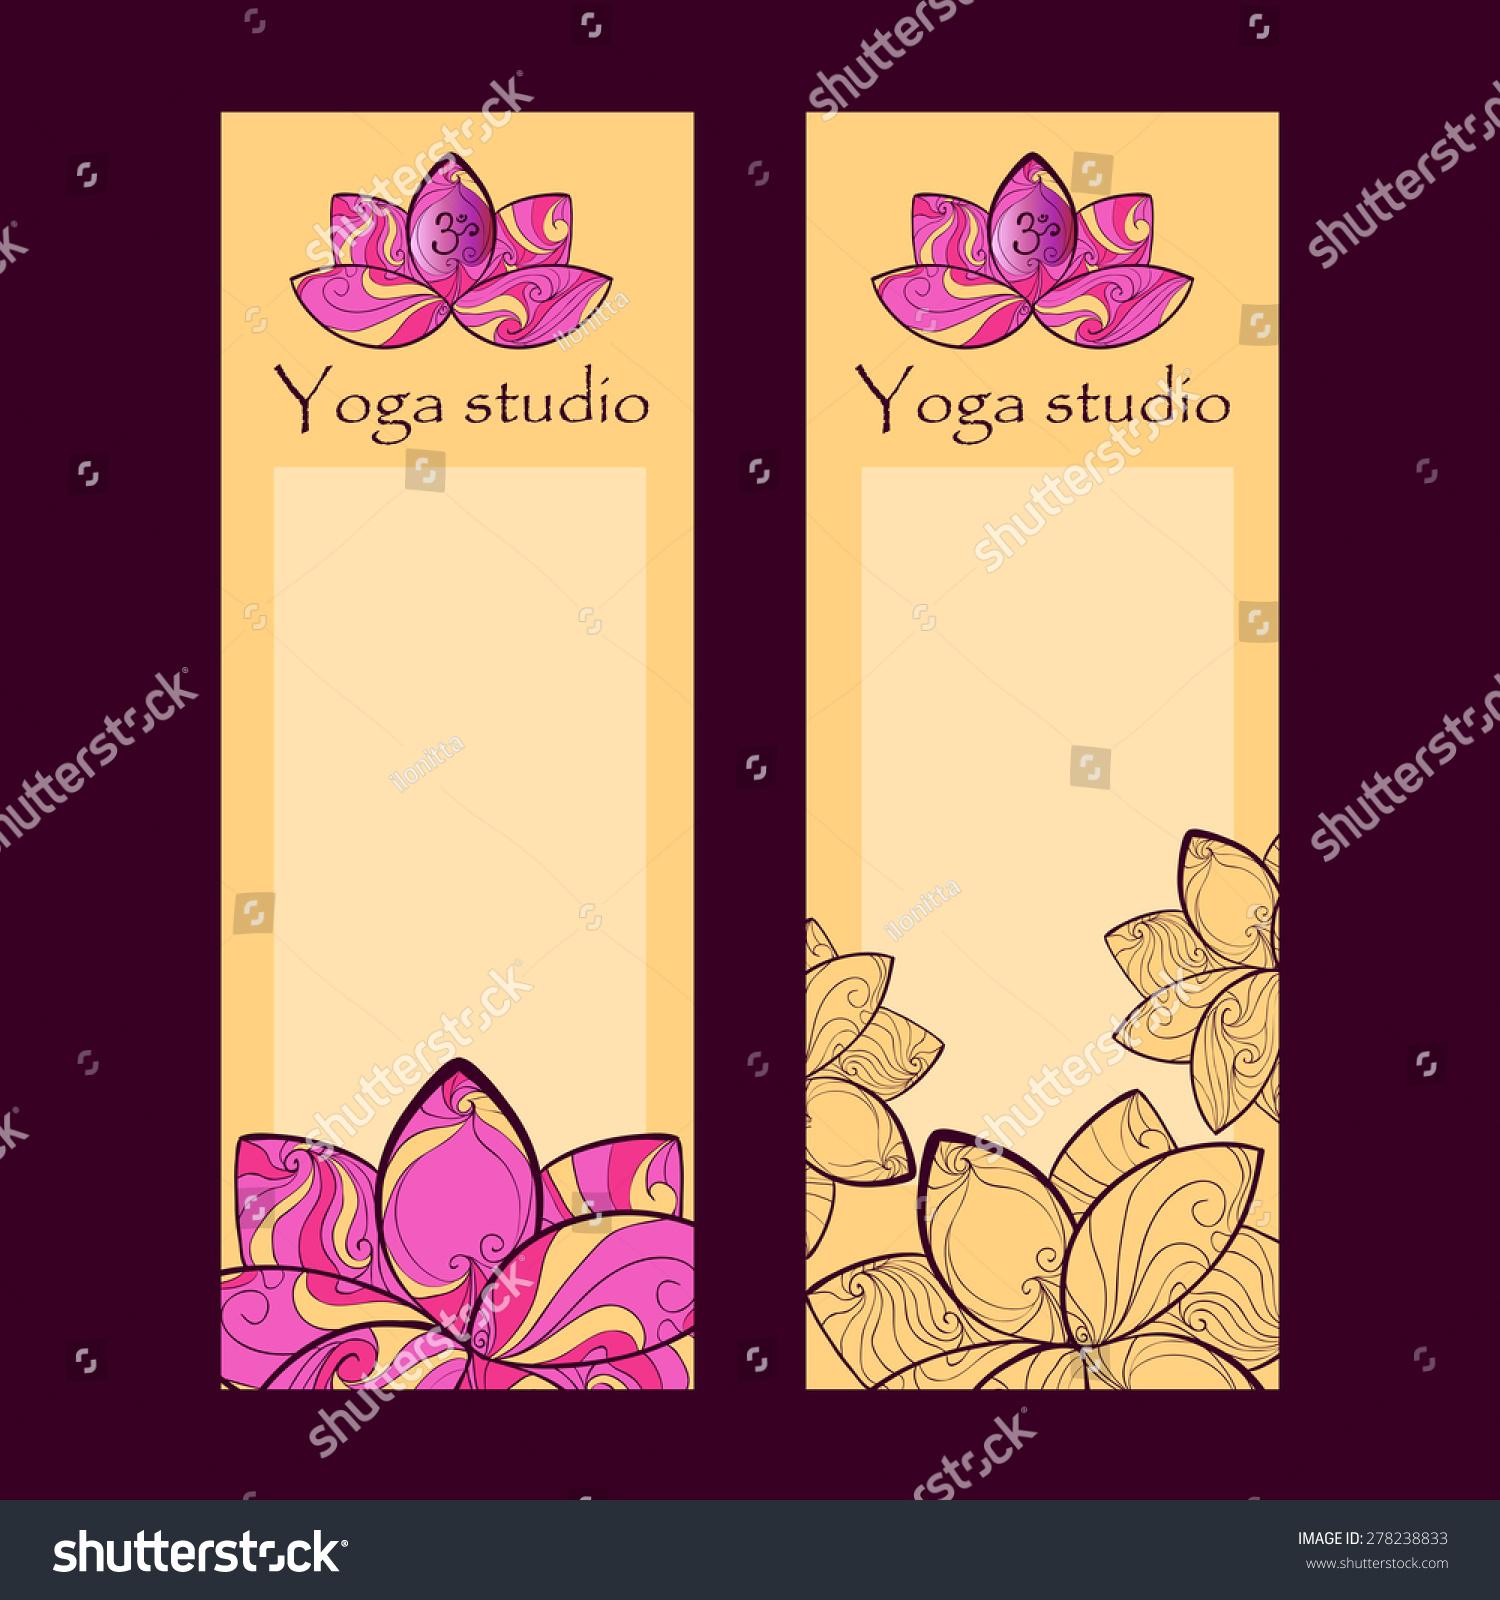 Yoga Design Flyer Business Card Lotus Stock Vector 278238833 ...